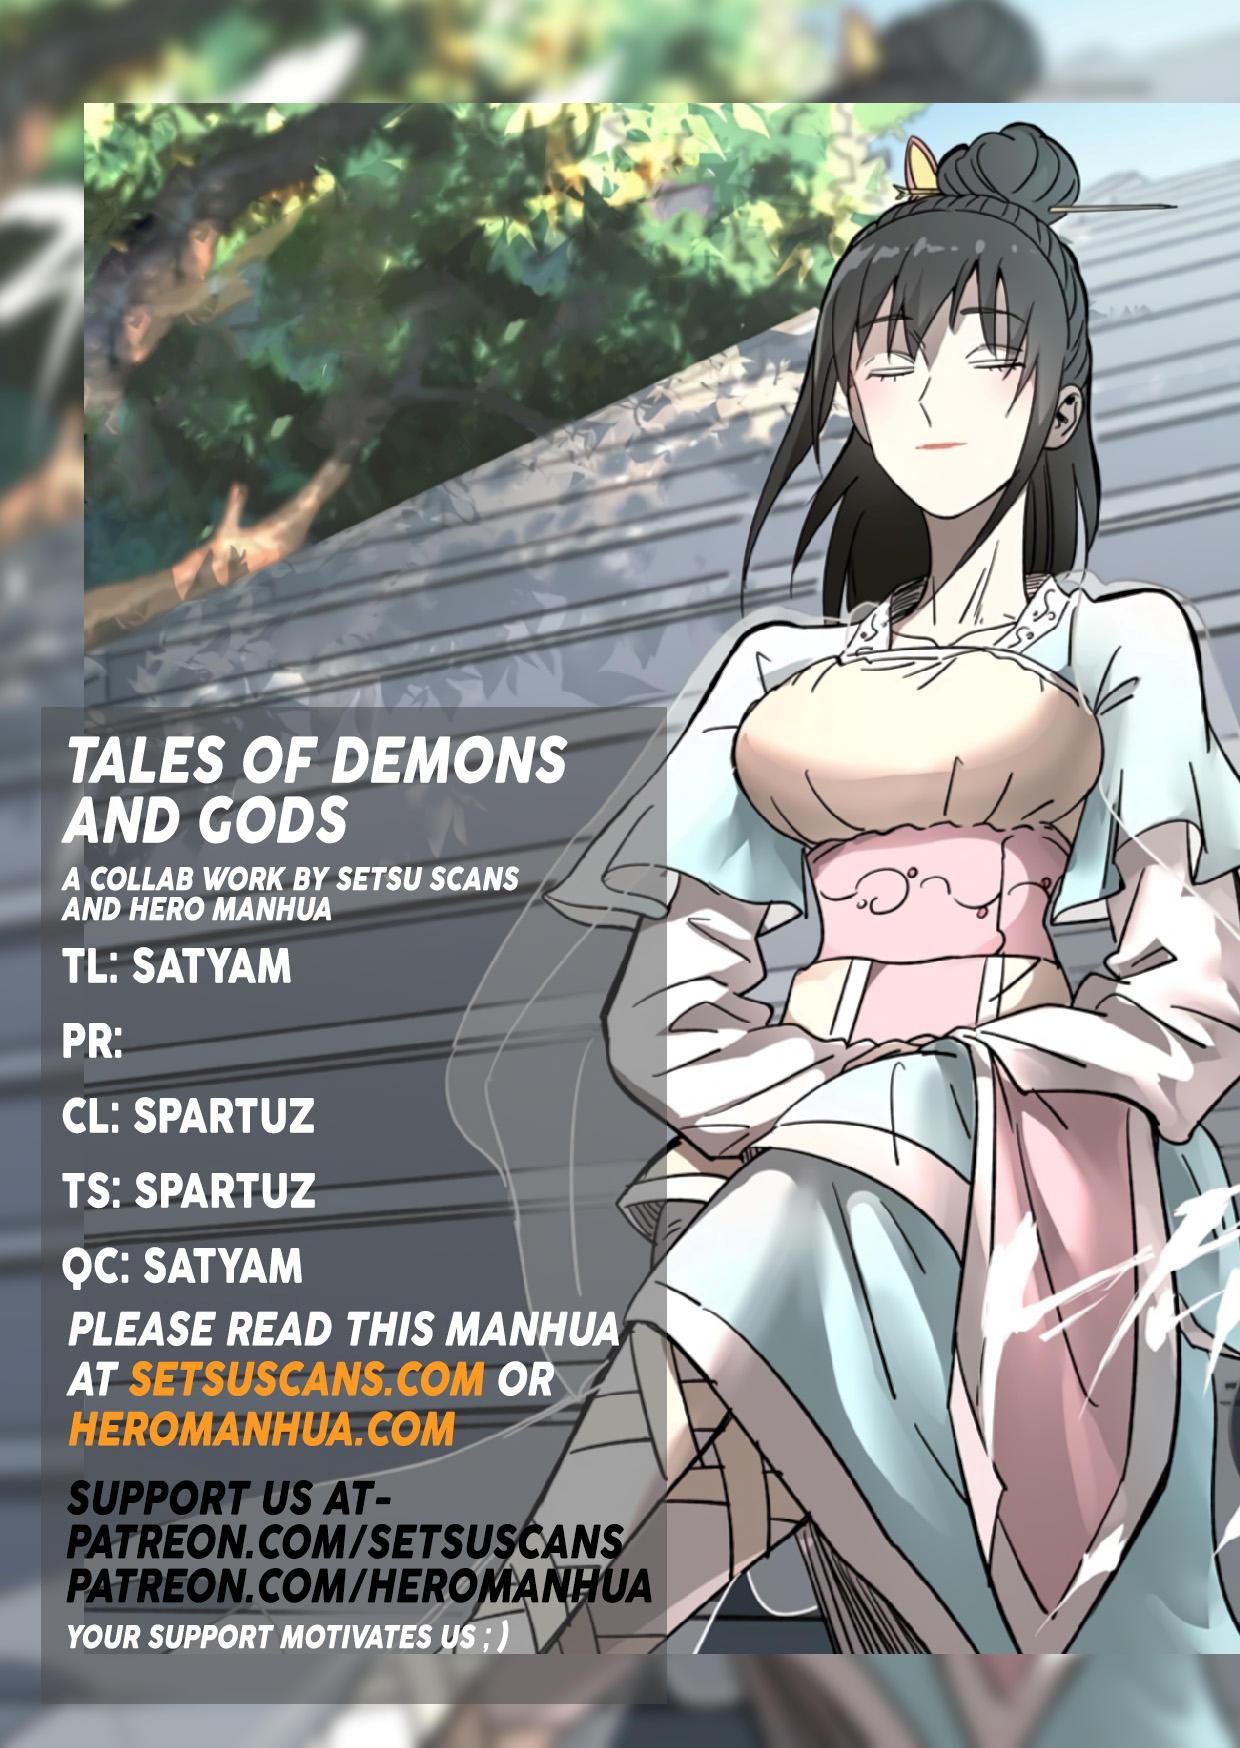 Tales Of Demons And Gods Chapter 341.1 page 1 - Mangakakalot